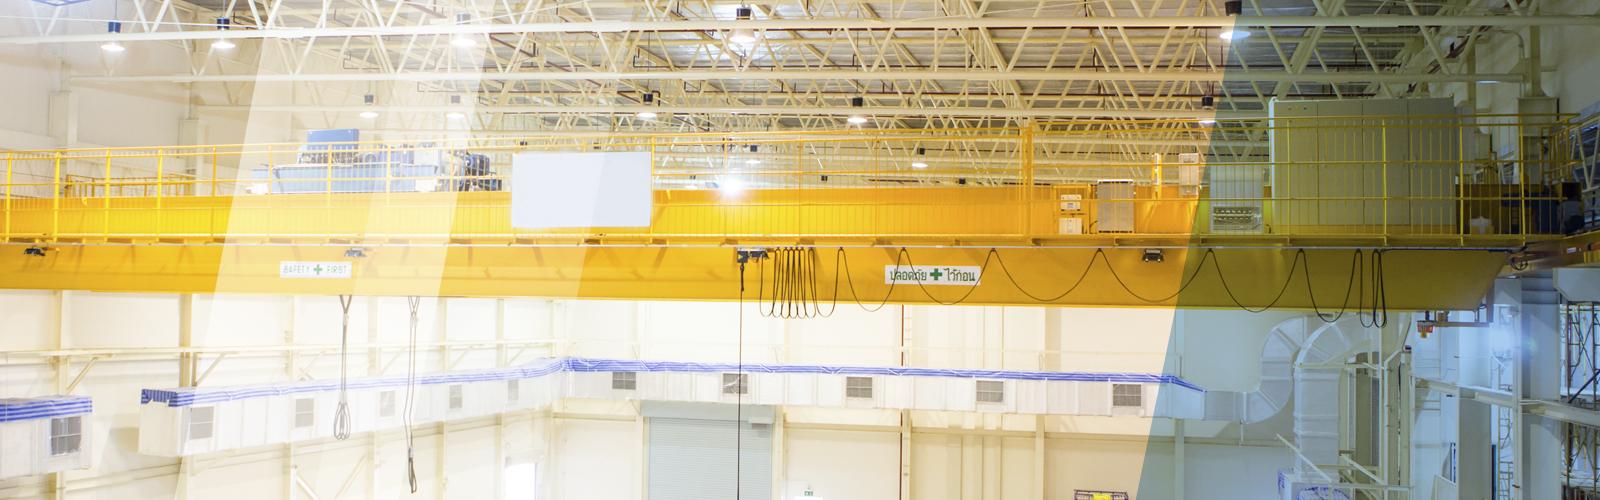 crane in warehouse